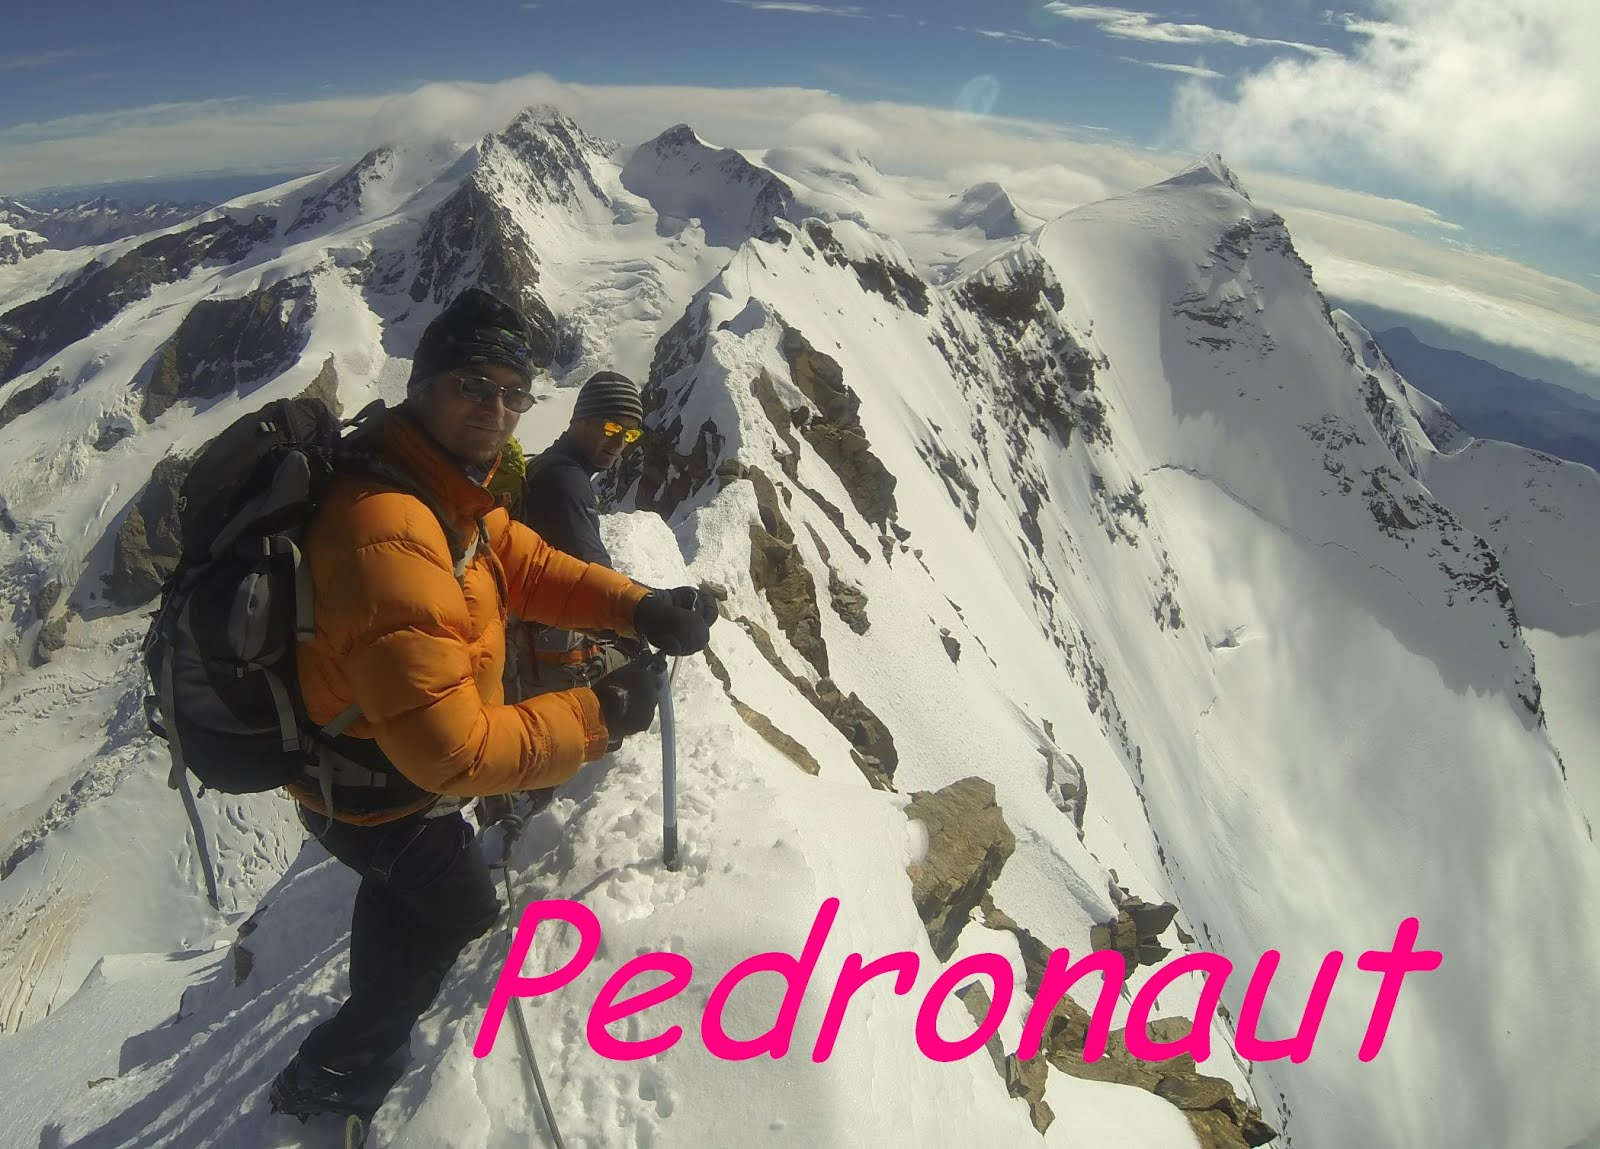 Pedronaut